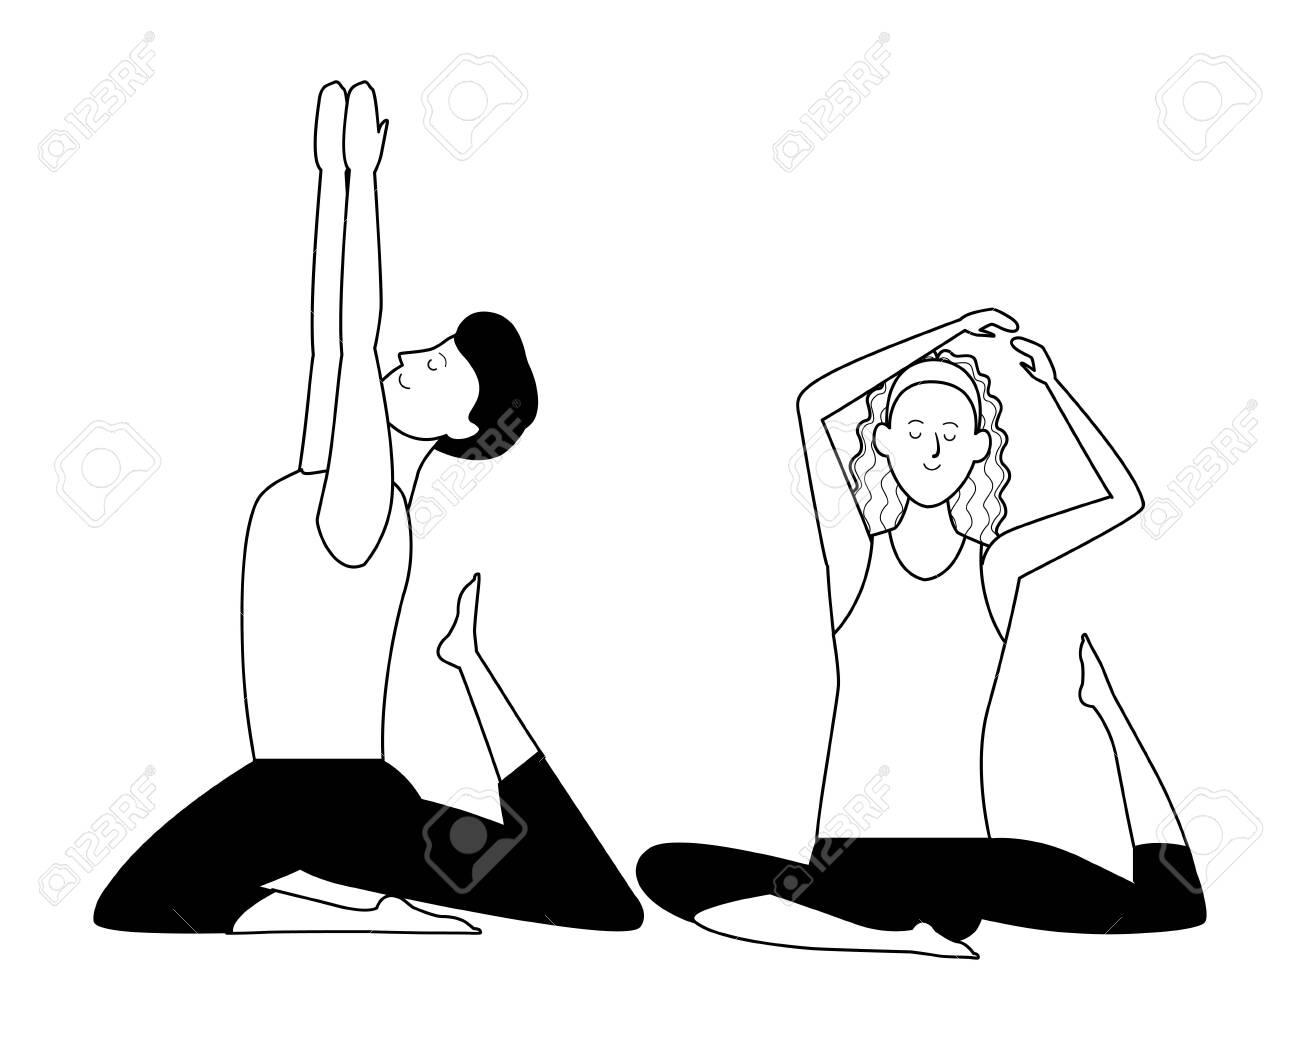 Couple Yoga Poses Avatars Cartoon Character Headband Black And Royalty Free Cliparts Vectors And Stock Illustration Image 126869950